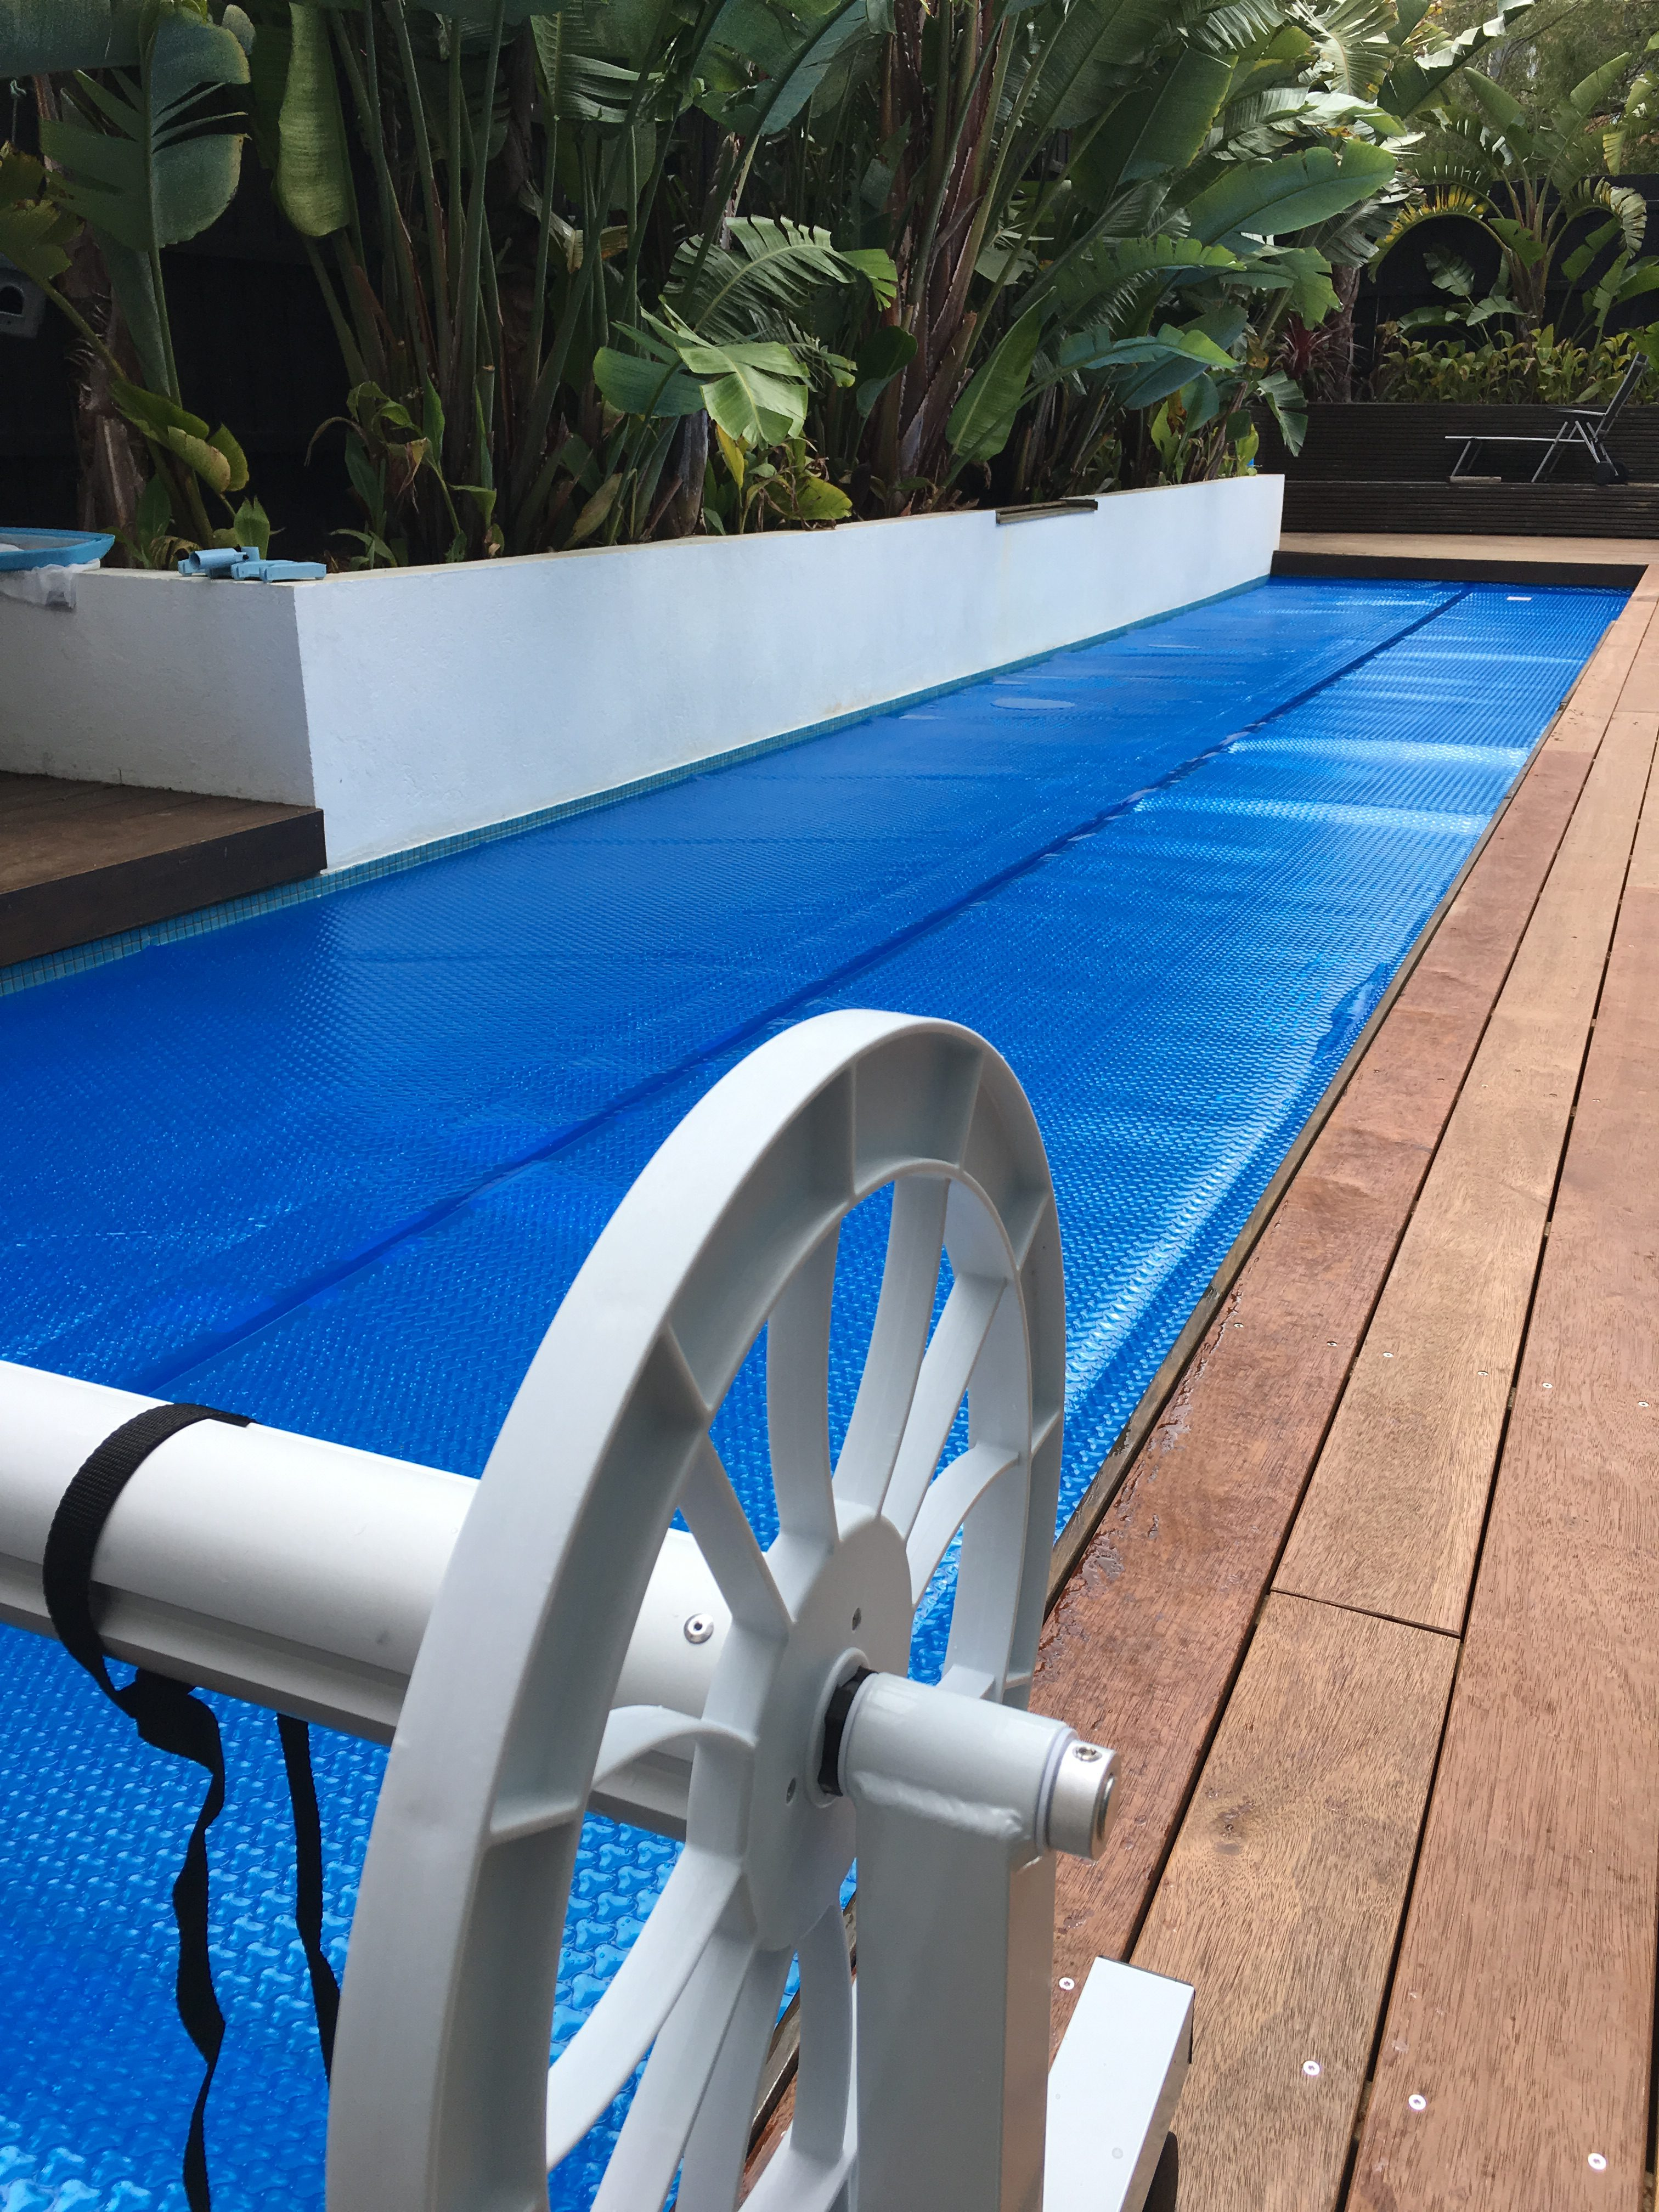 Swimming Pool Solar Blanket